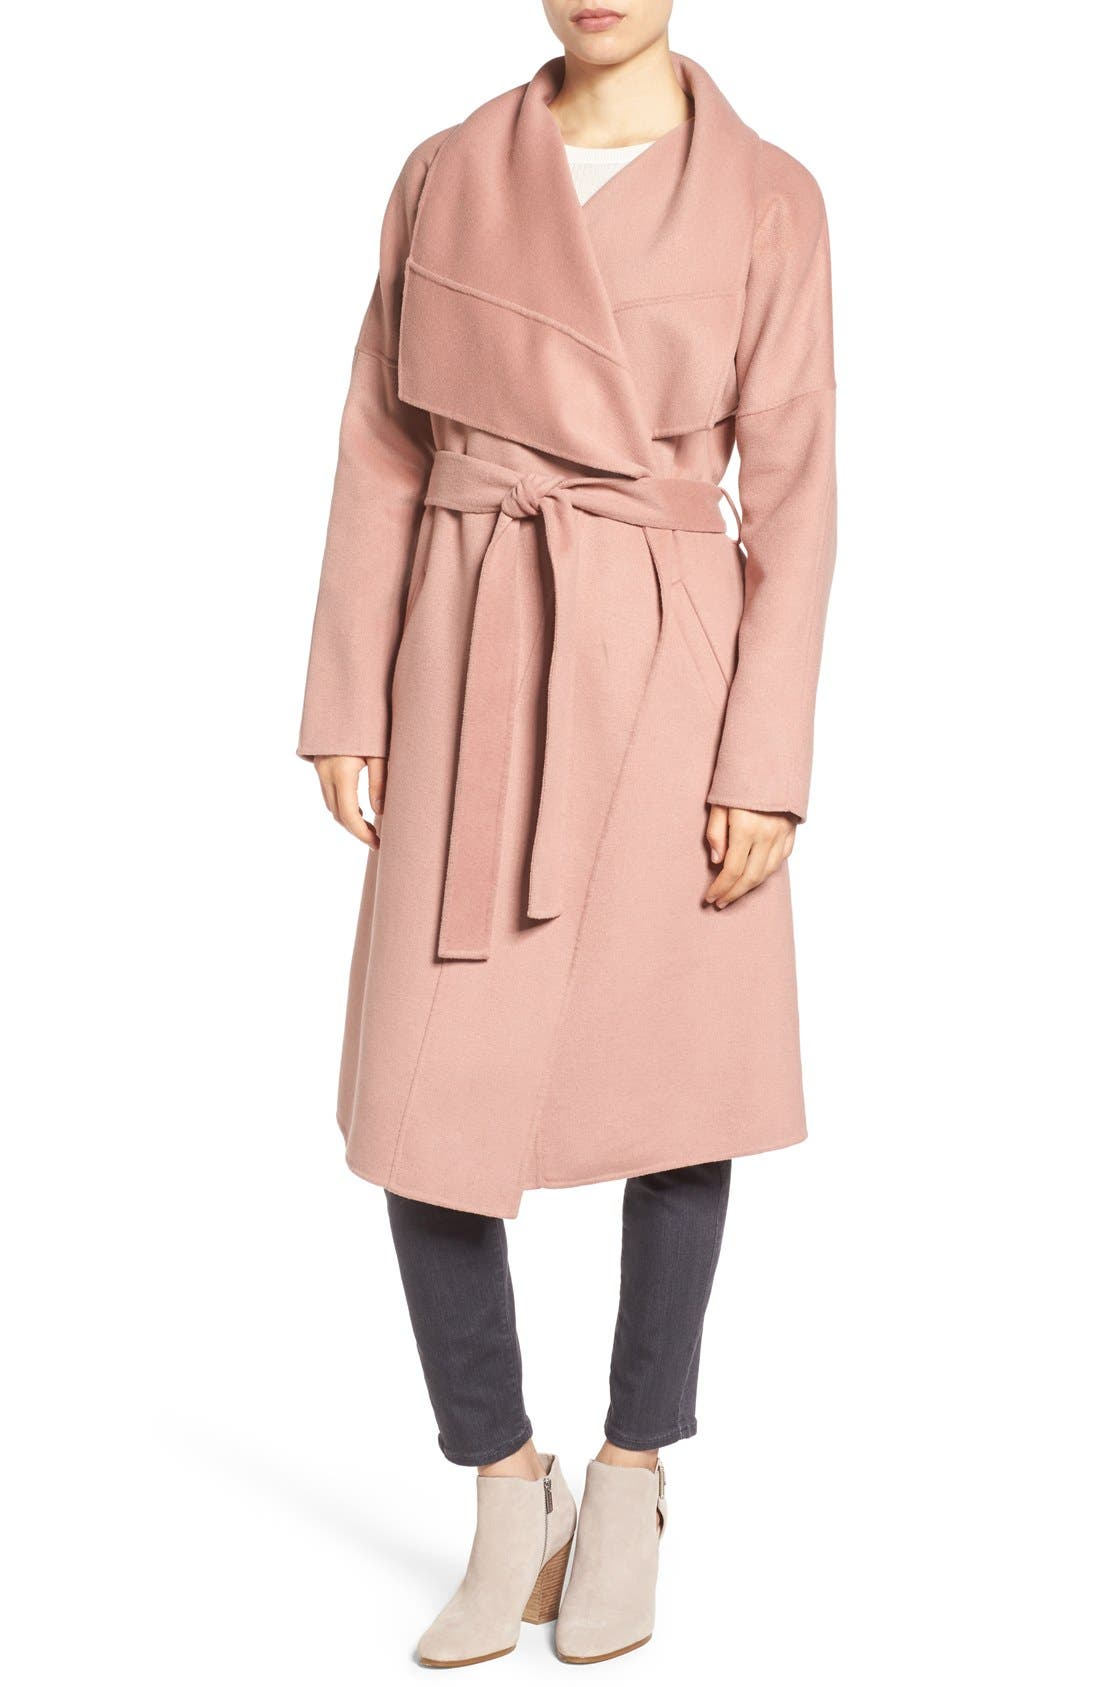 Badgley Mischka 'Lex' Double Face Wool Blend Wrap Coat